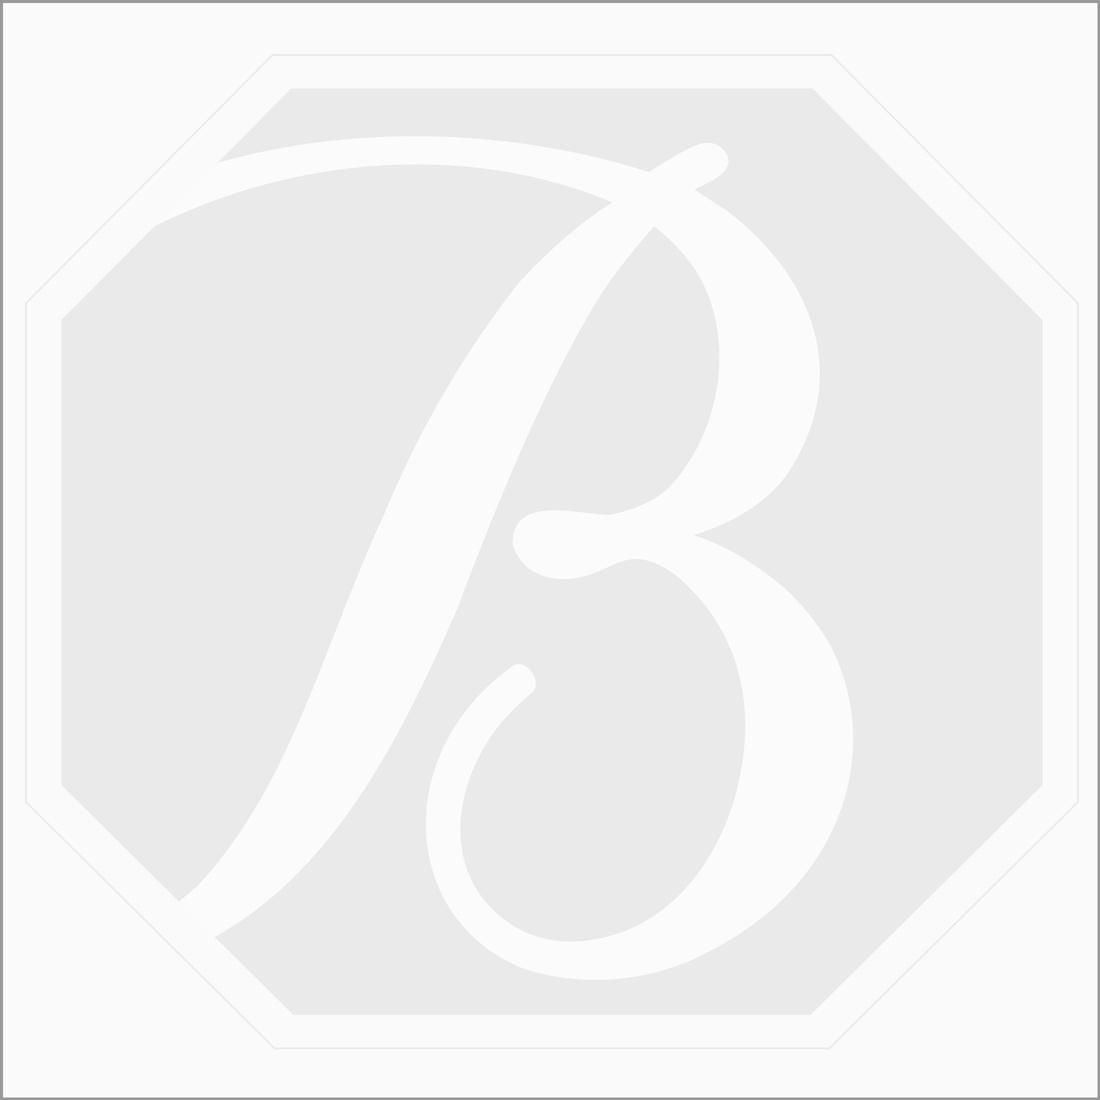 18kt Yellow Gold Tiffany & Co Flower Brooch - EST1406